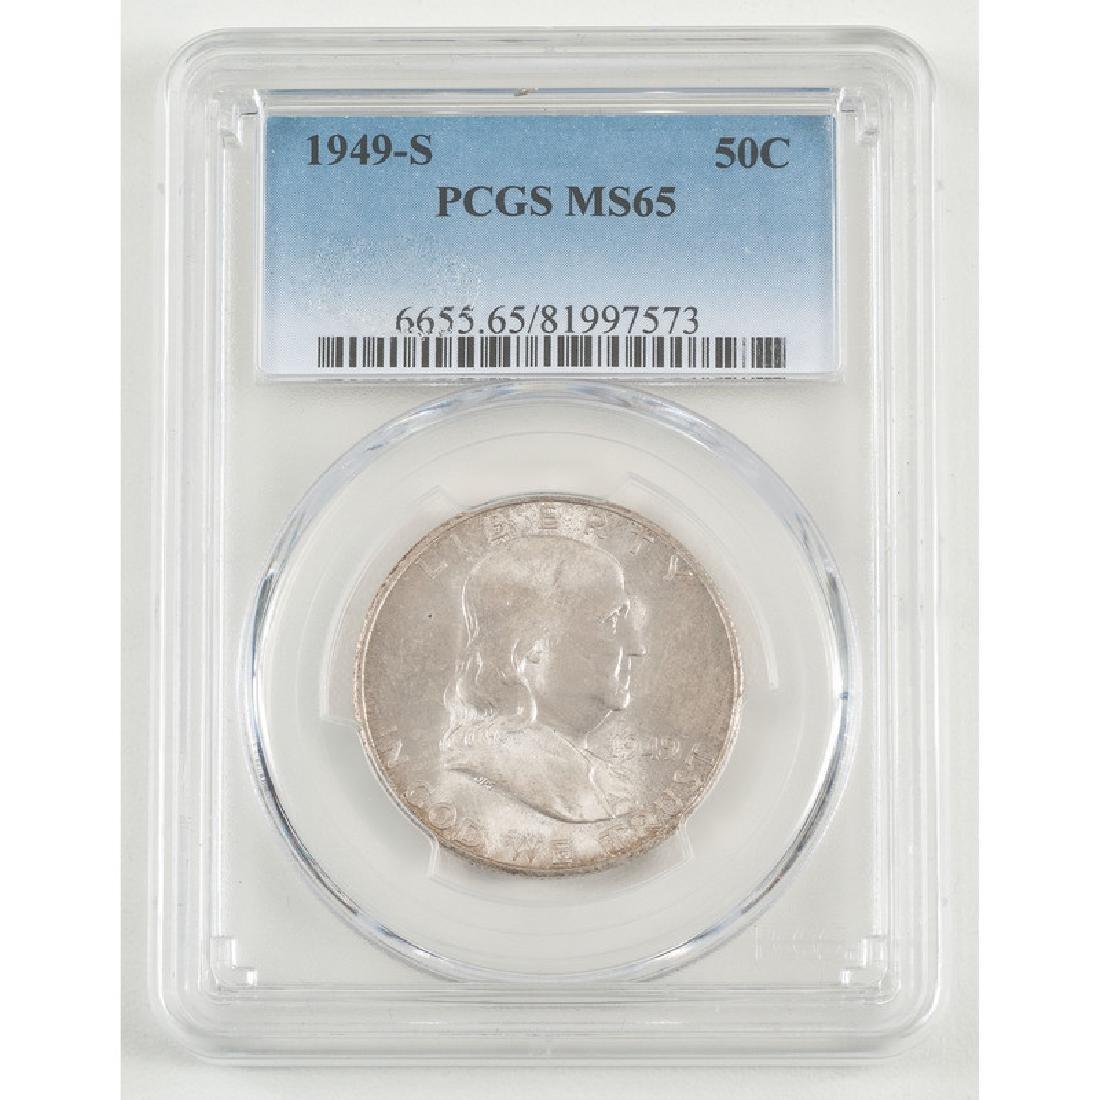 United States Franklin Half Dollar 1949-S, PCGS MS65